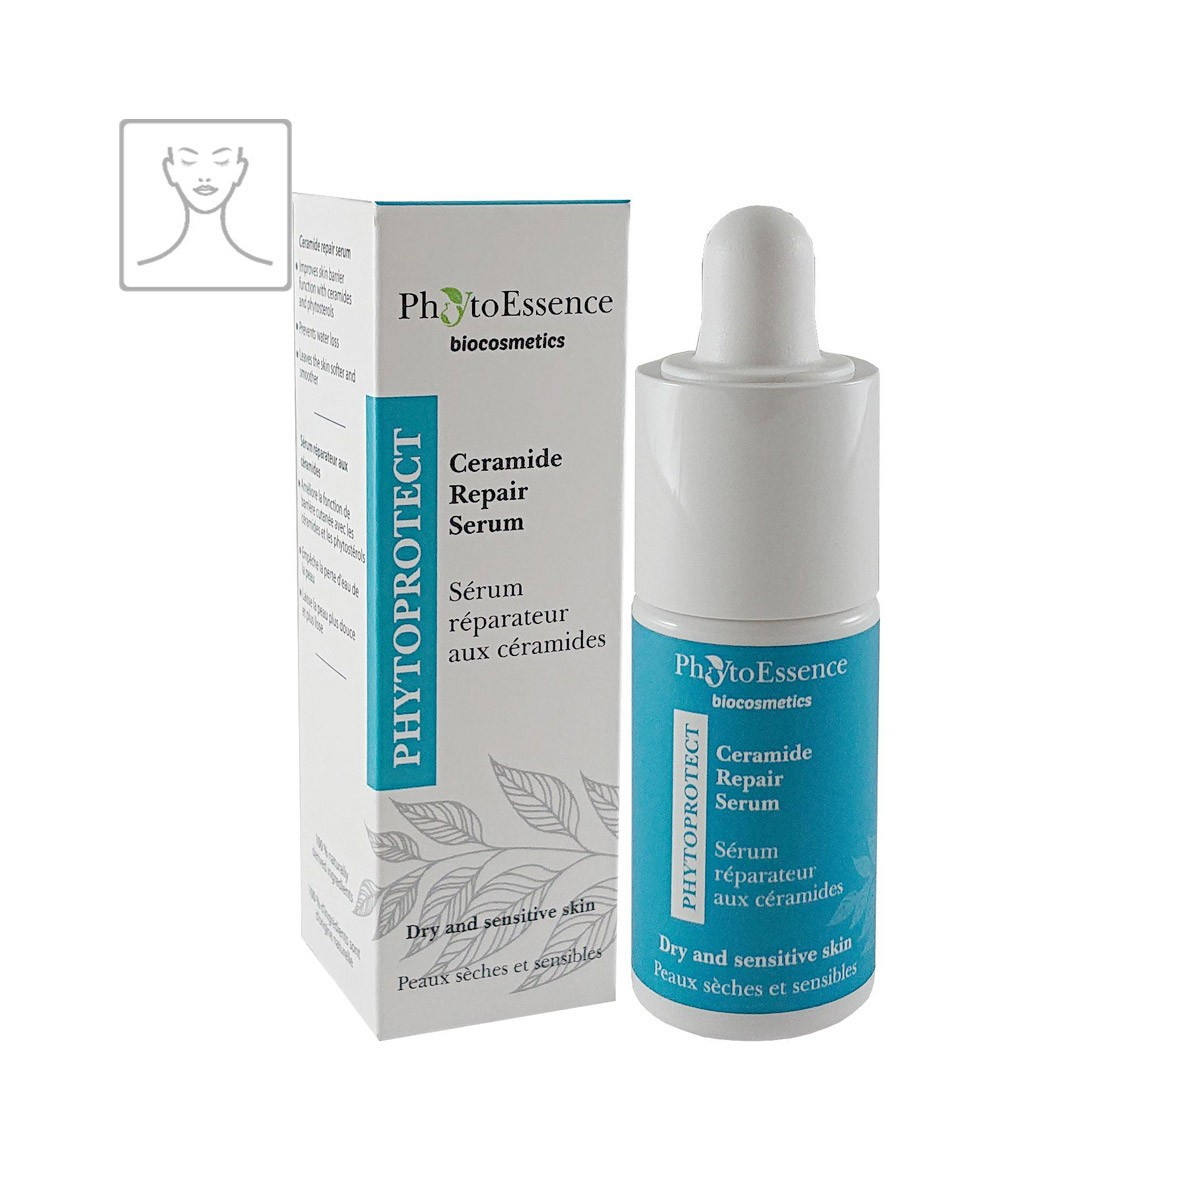 Ceramide Repair Serum PhytoEssence ceramidové opravné pleťové sérum s bisabololem a heřmánkem